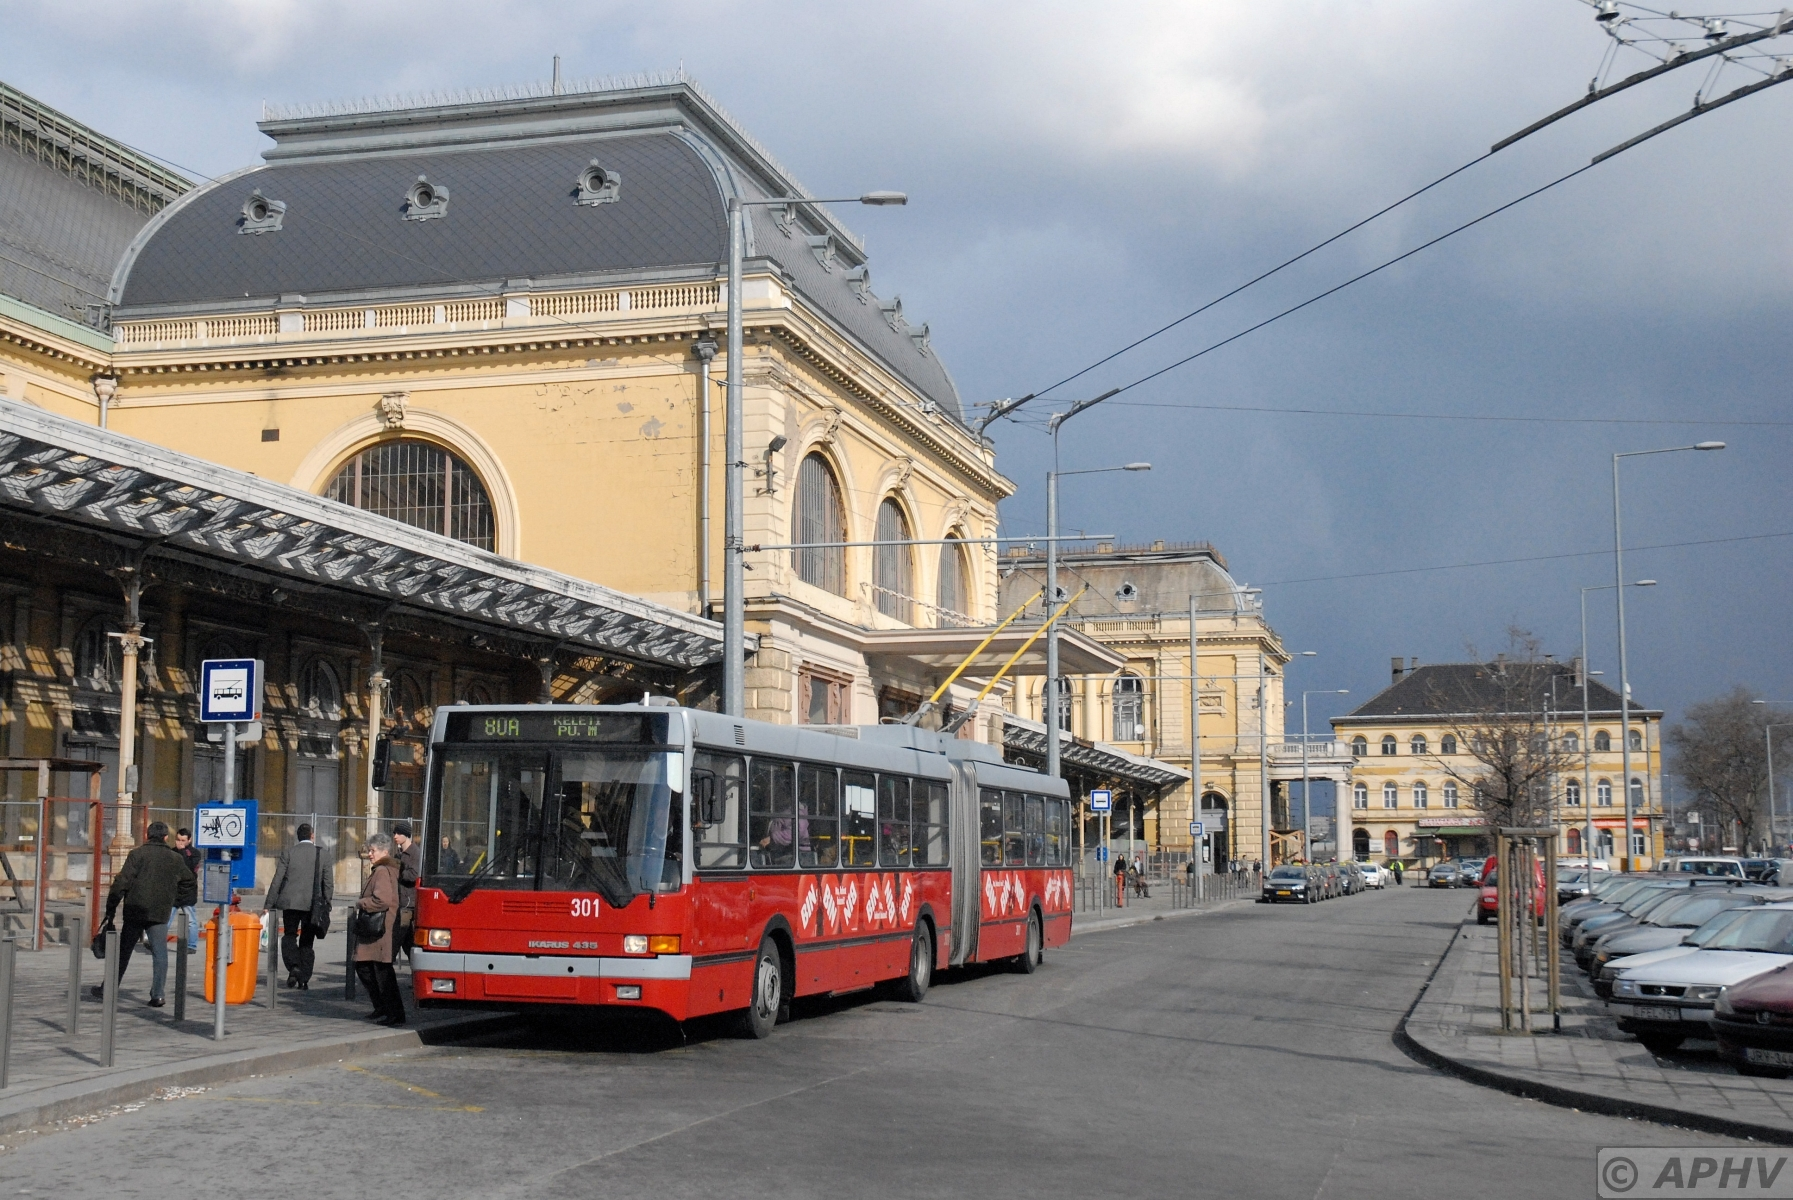 http://petervelthoen.nl/content/aphv_3585_DSC_0139_ps__bus_301_Ikarus_line_80A_st_Keleti_pu_Budapest_10-3-2009_aphv_bewerkt-2.jpg